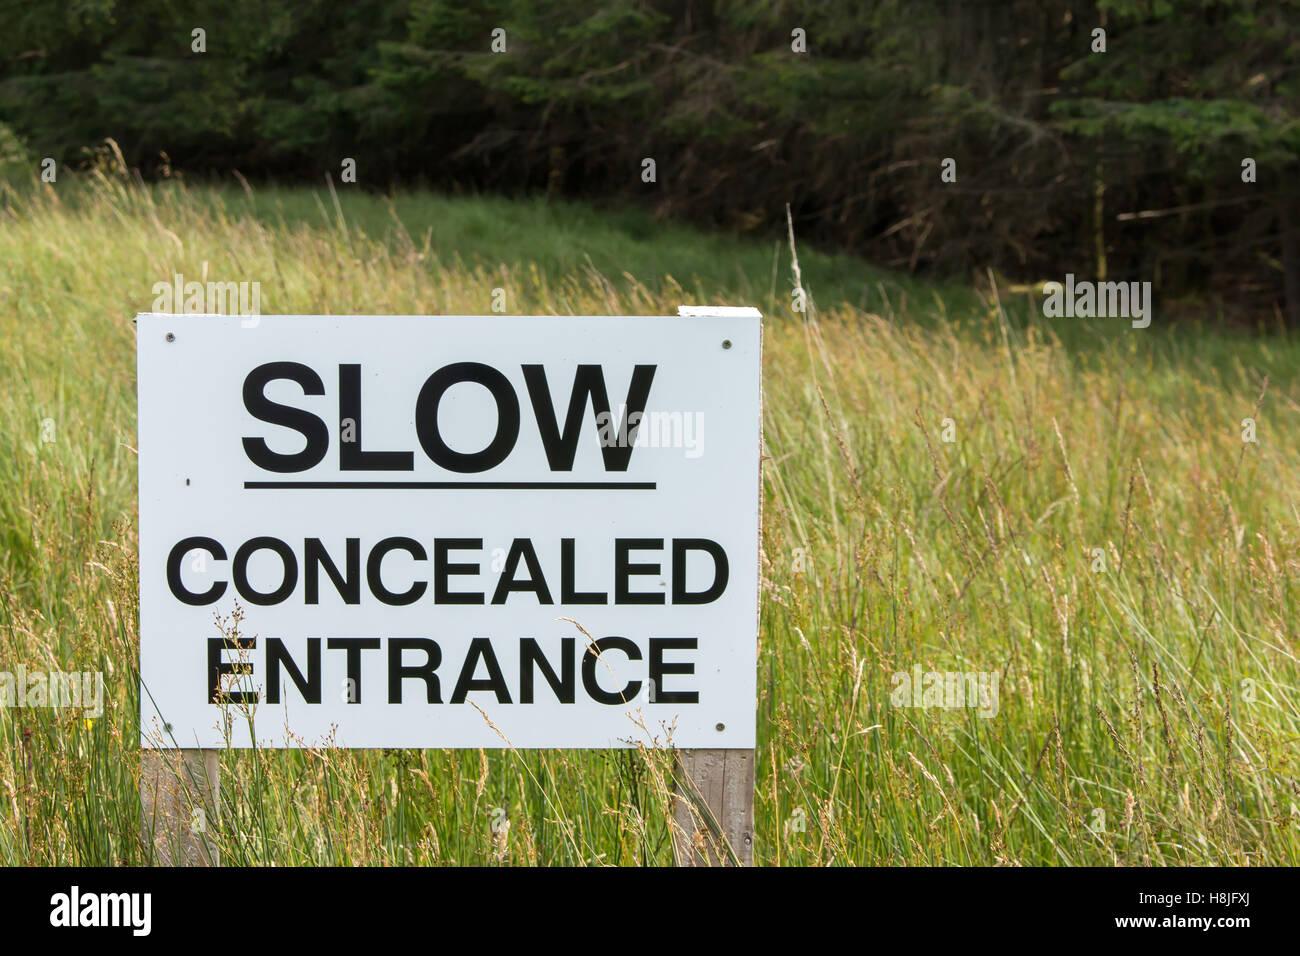 Sign warning, SLOW concealed entrance - Stock Image